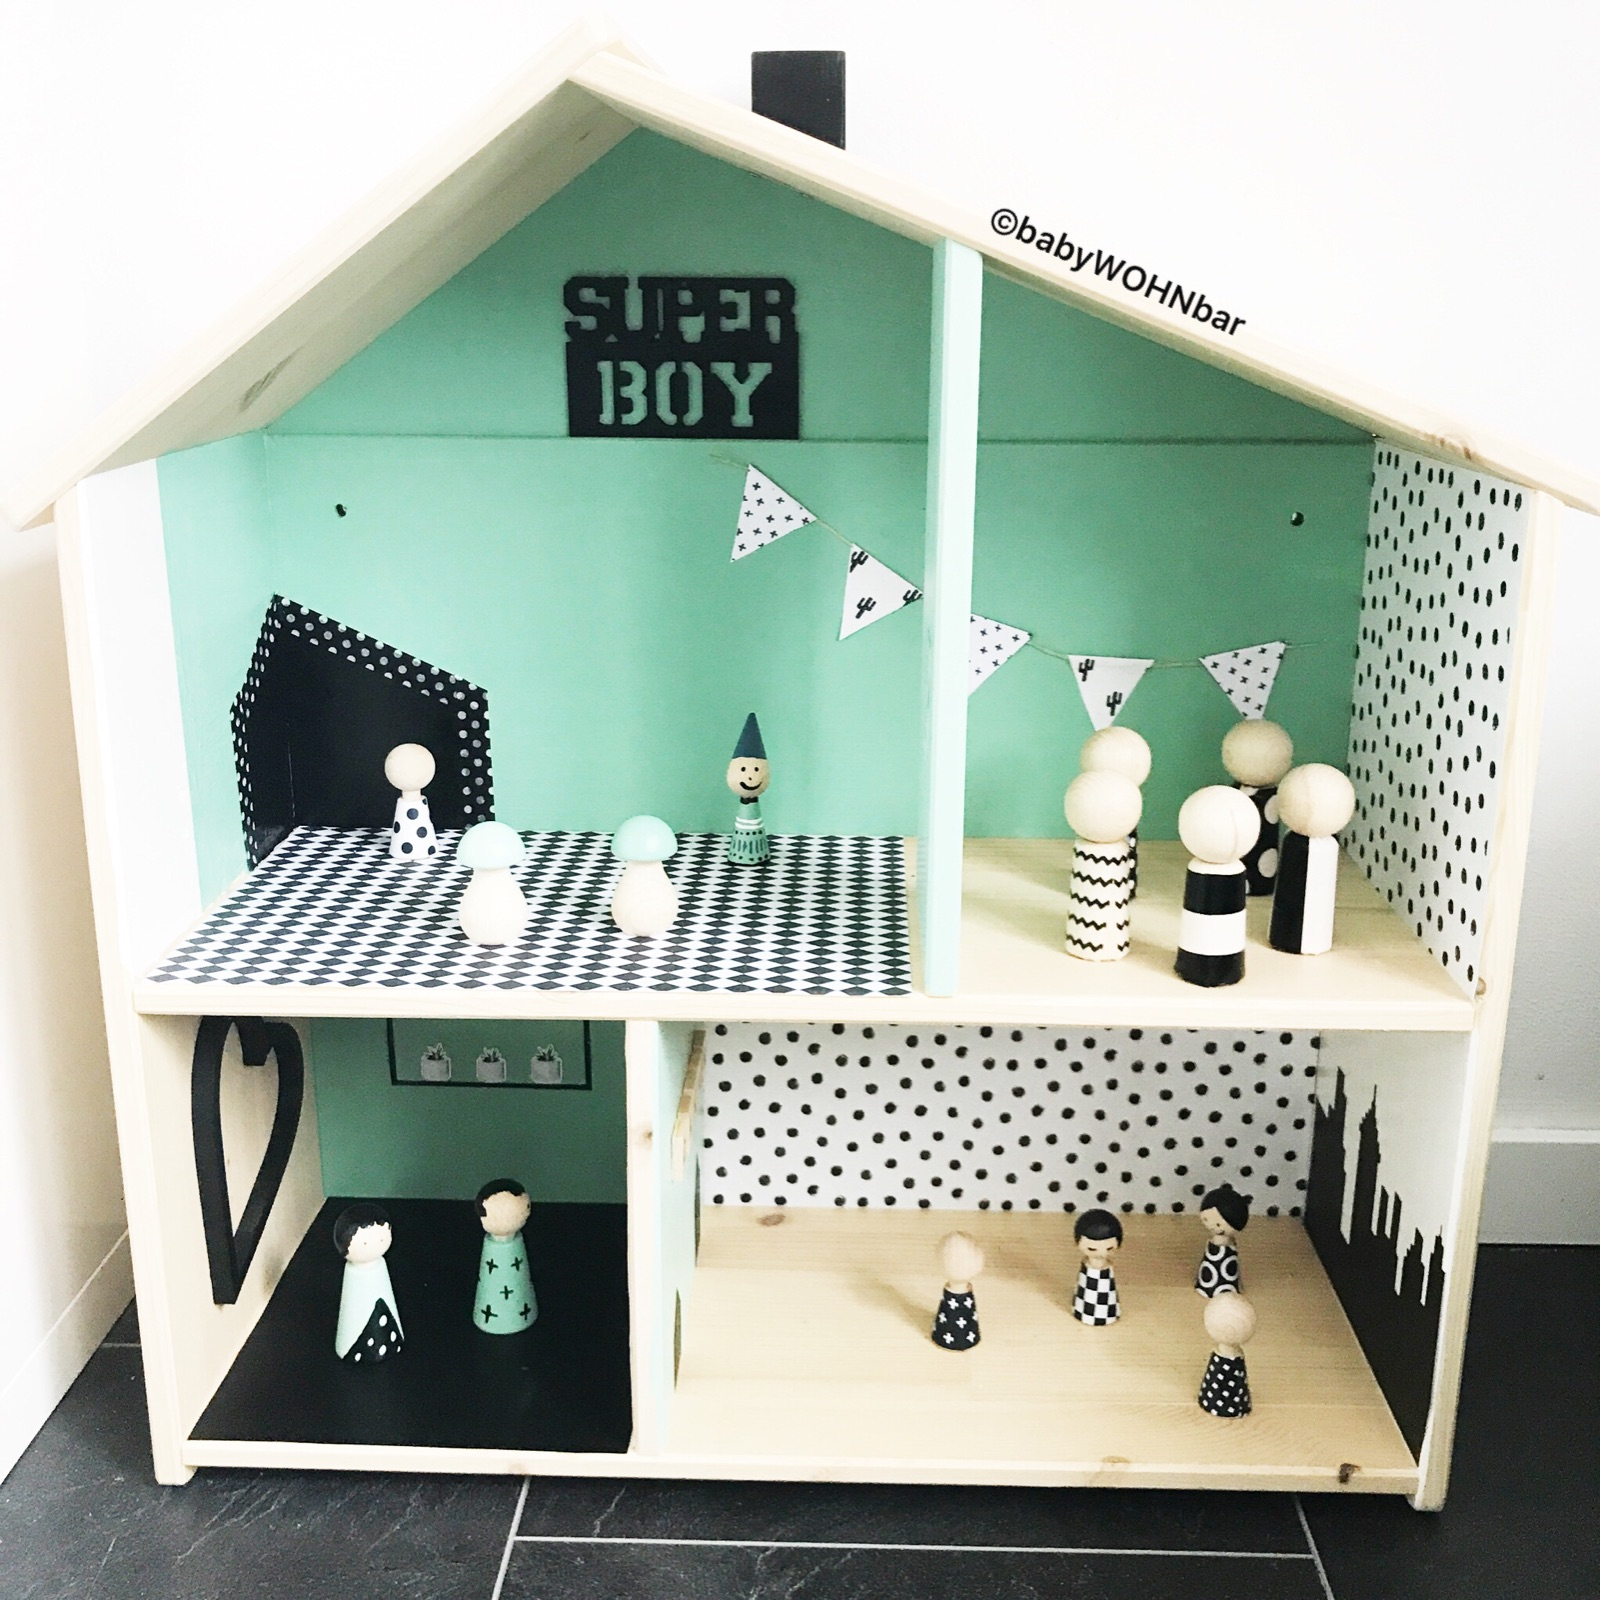 Ikea flisat babywohnbar - Ikea puppenhaus mobel ...